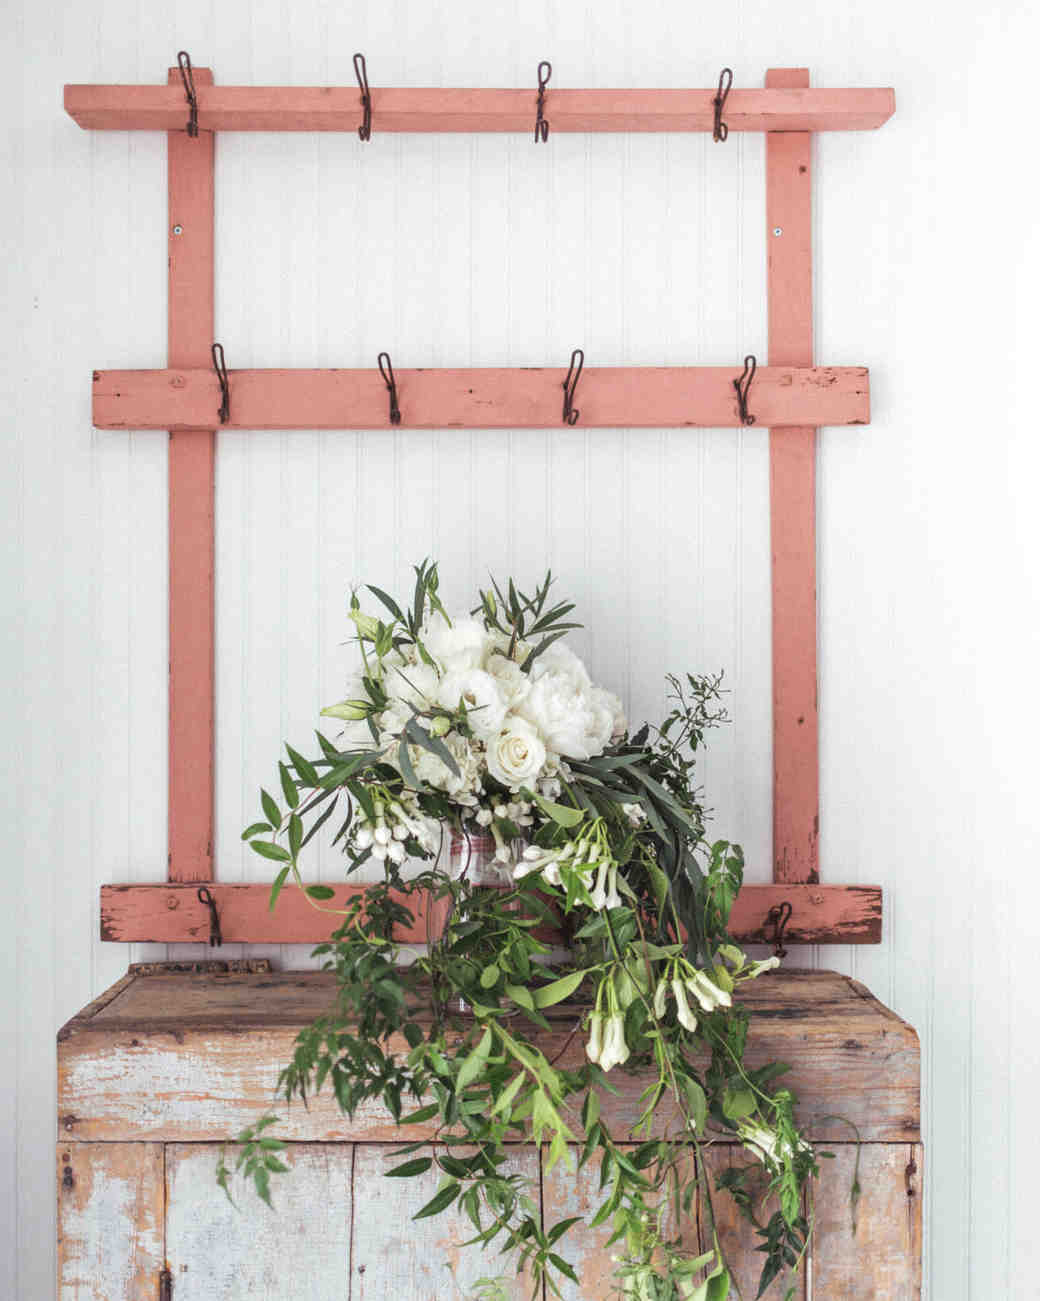 leah-michael-wedding-bouquet-9727-s111861-0515.jpg